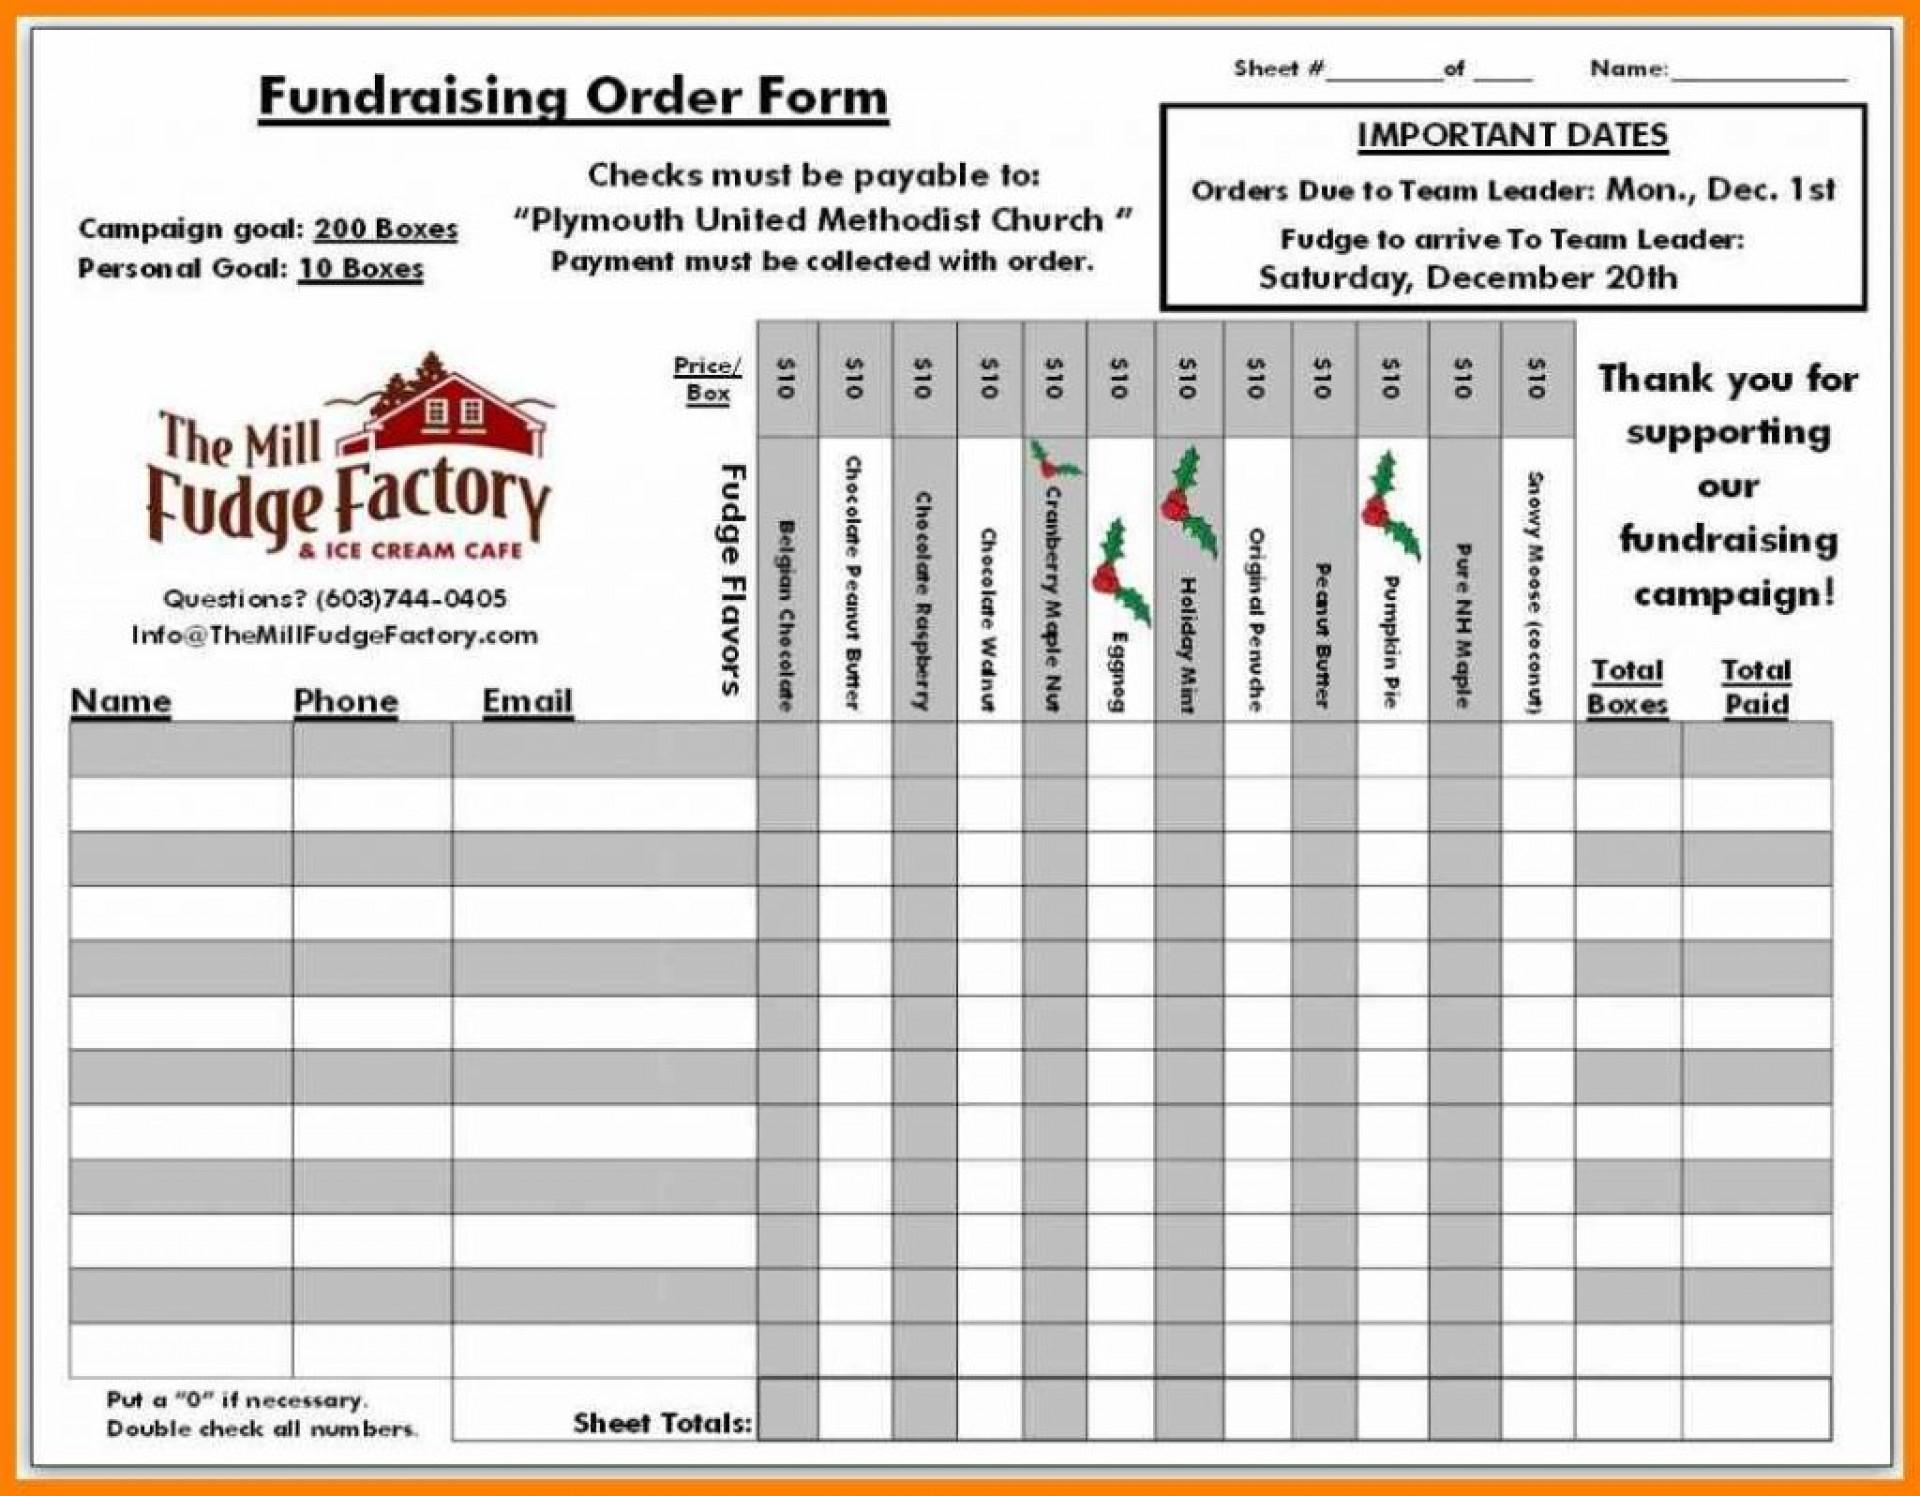 Fundraising Spreadsheet Template Intended For 010 Fundraising Order Form Templates Template Ideas Doc1400758 Meter